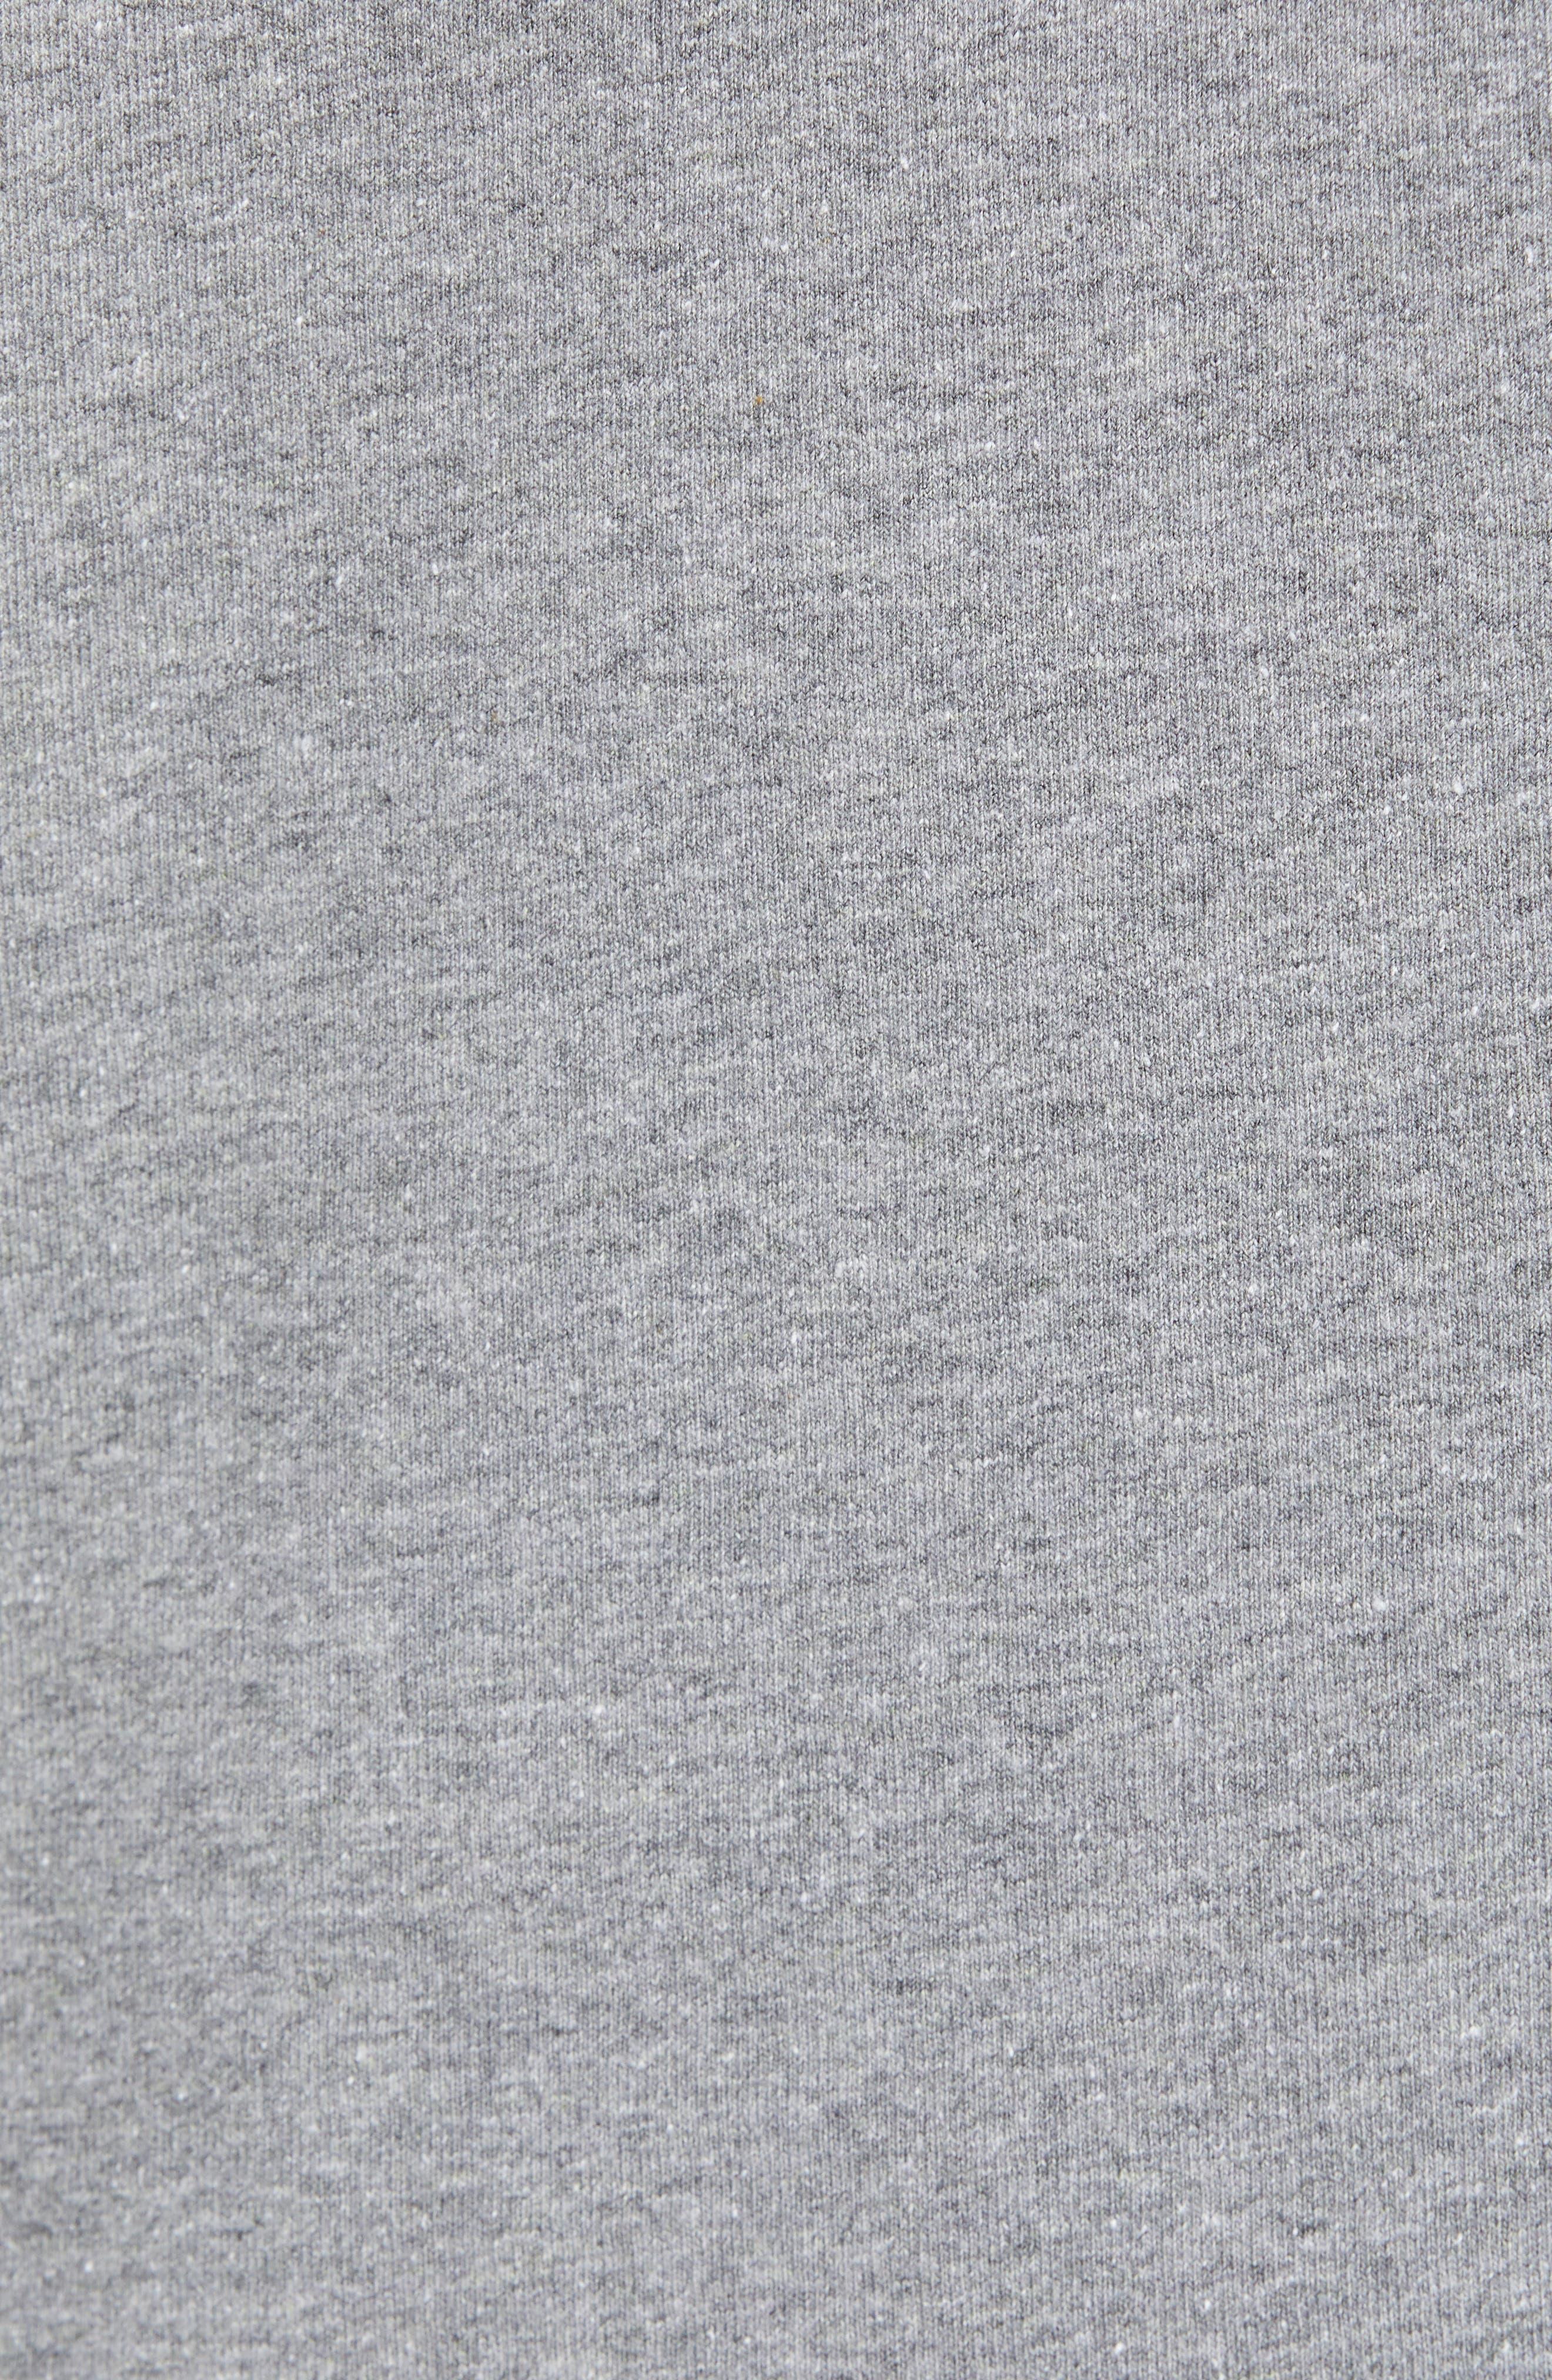 Fitz Roy Scope Long Sleeve Responsibili-Tee T-Shirt,                             Alternate thumbnail 5, color,                             GRAVEL HEATHER